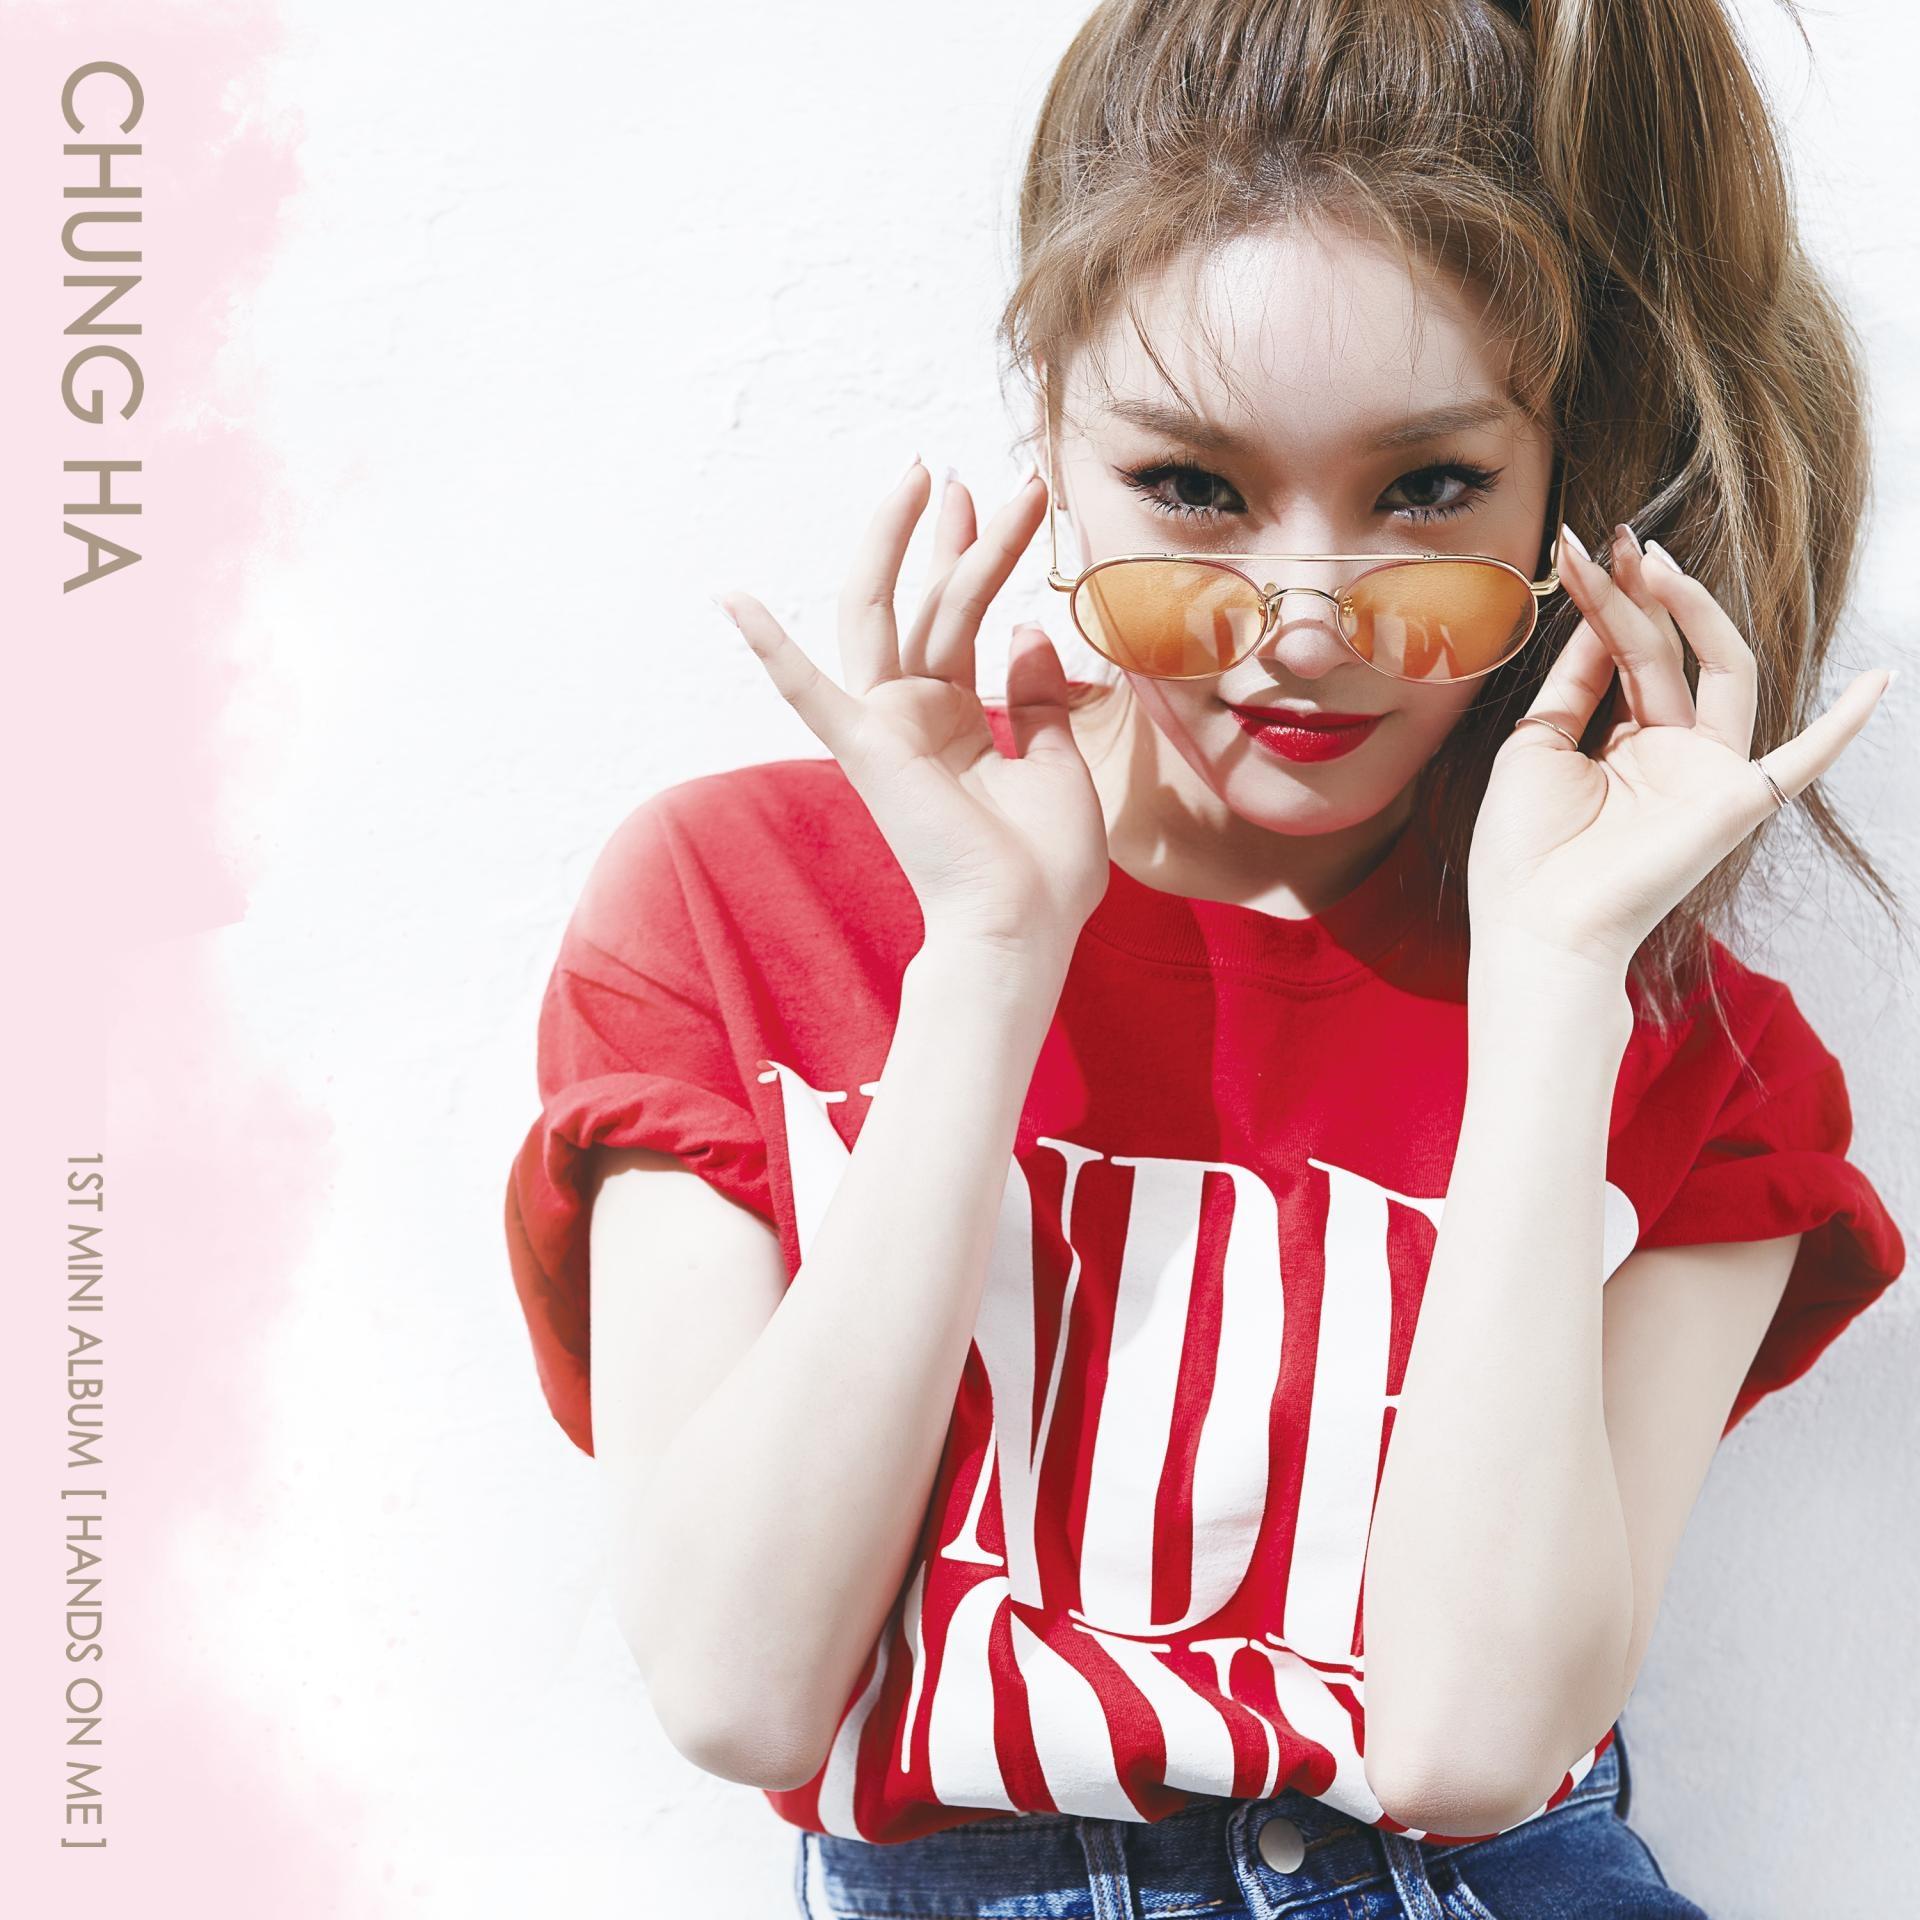 teaser1-chngh